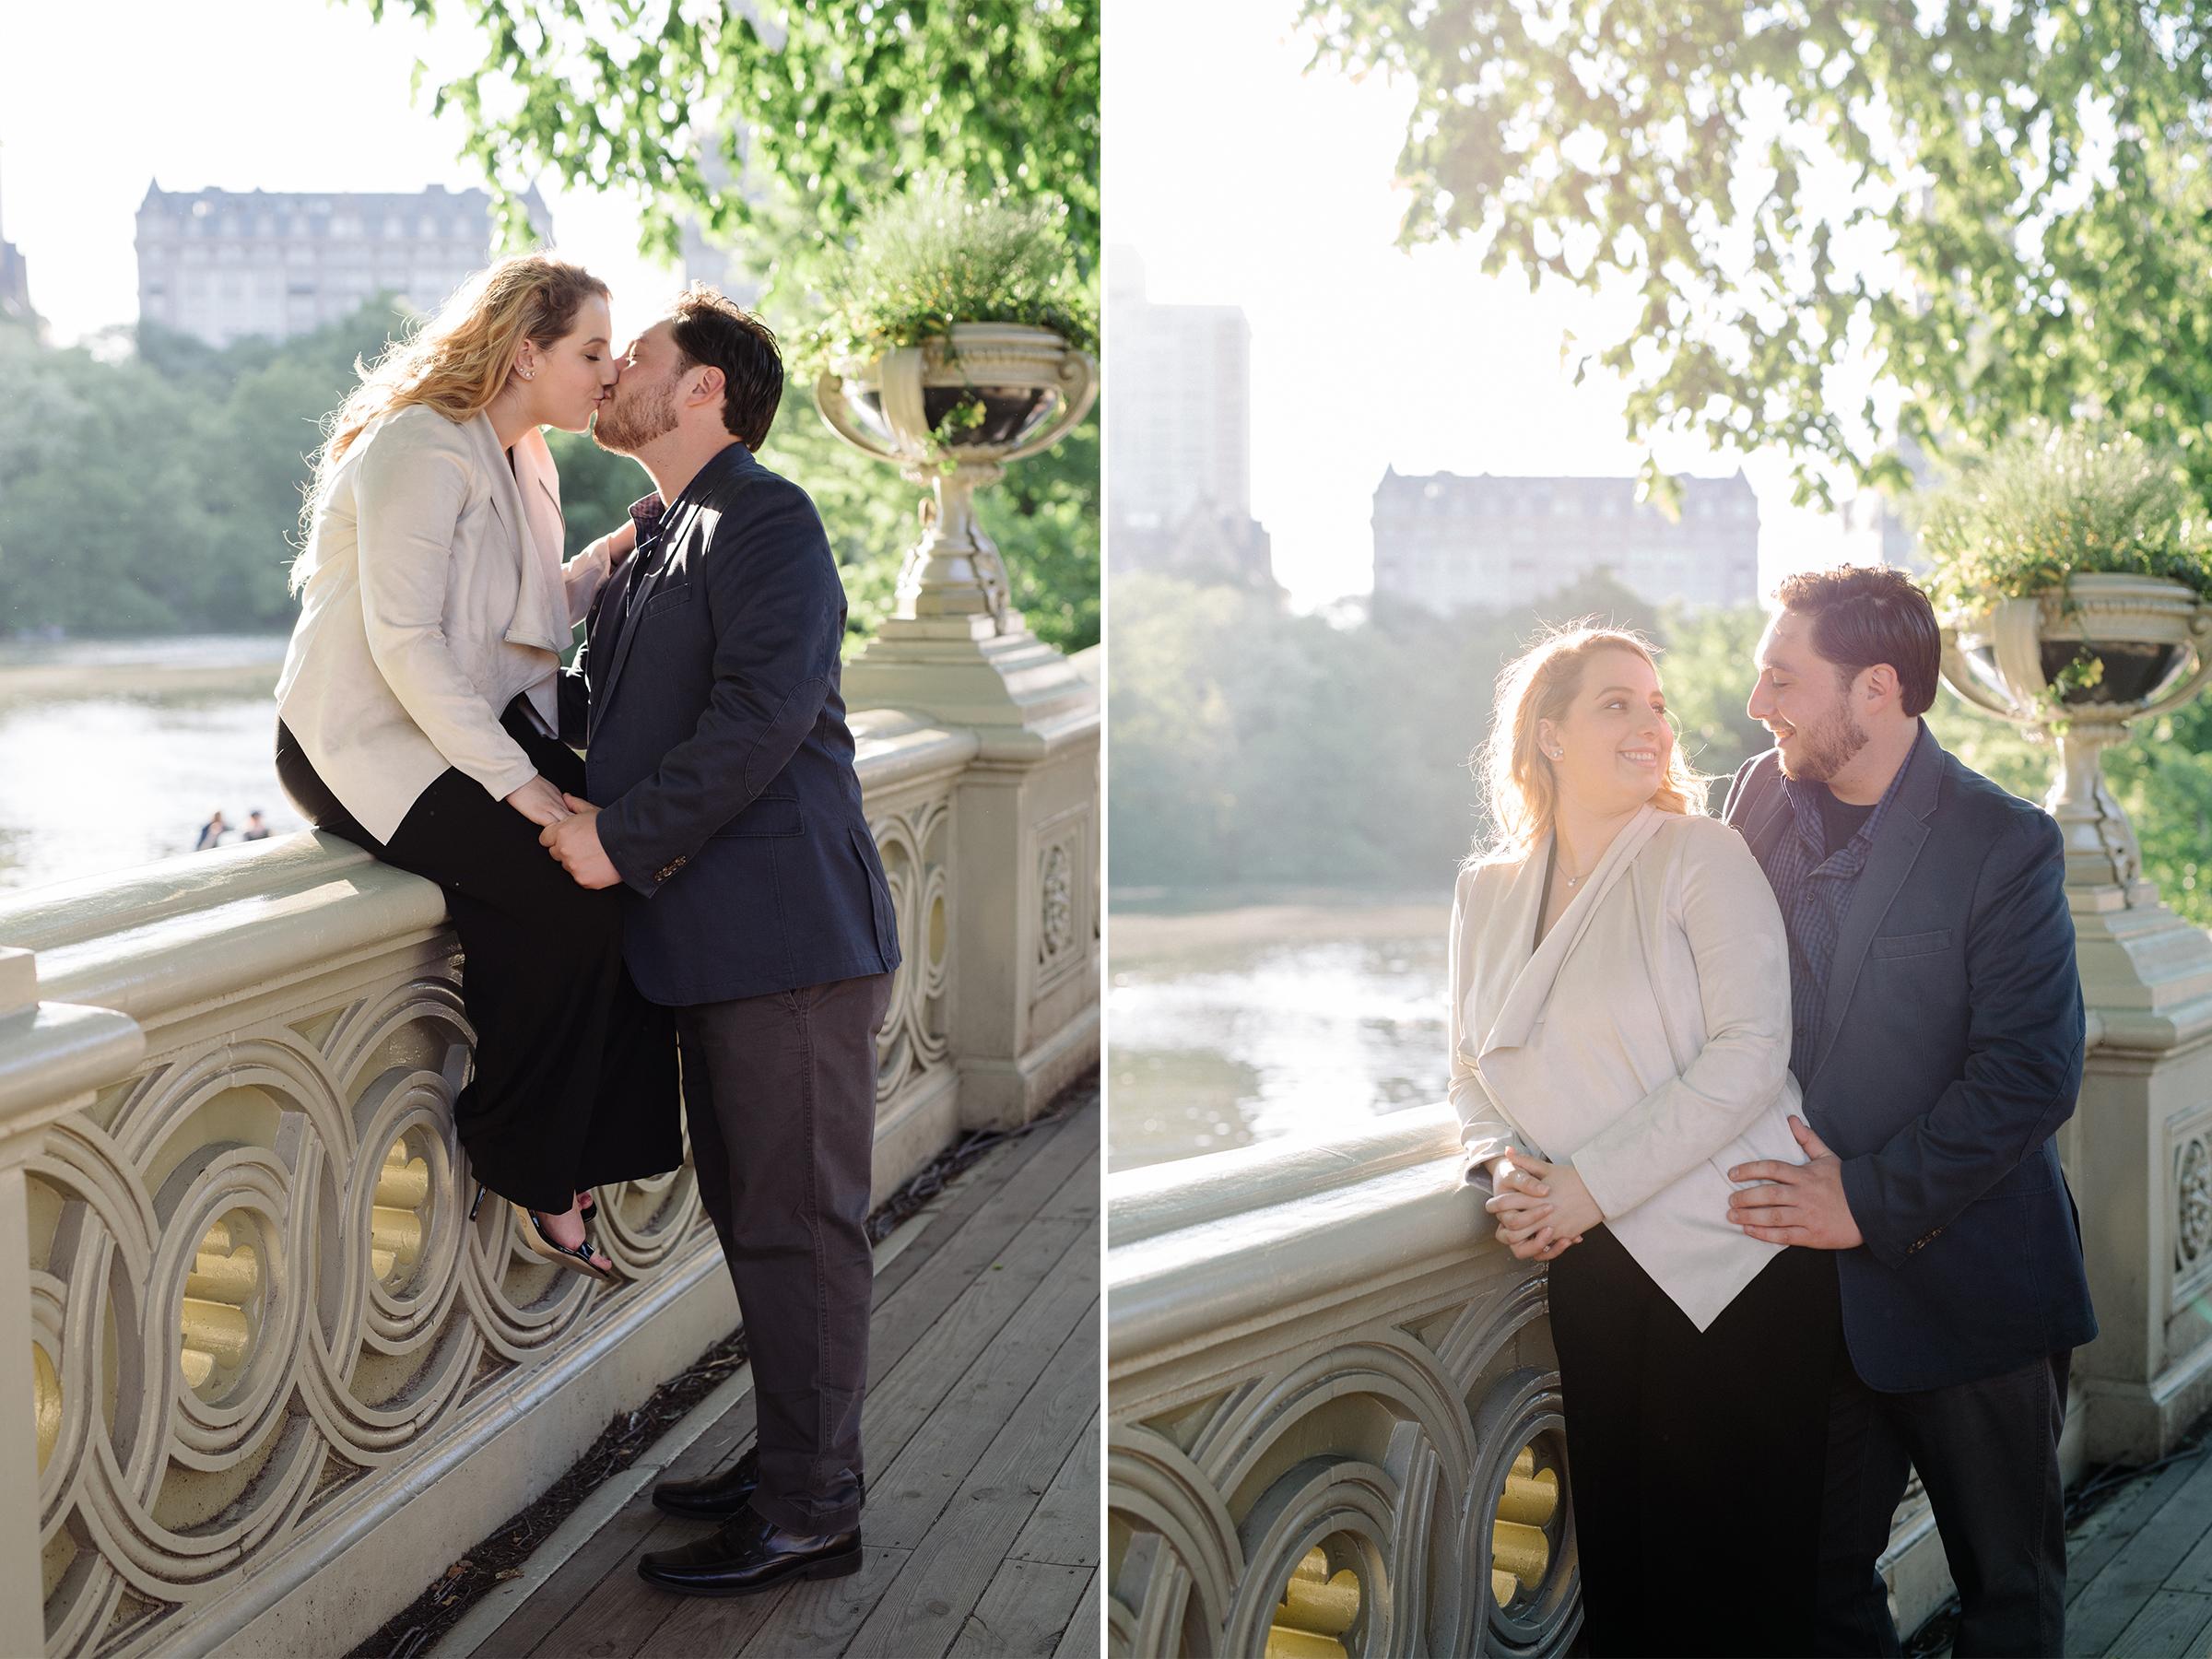 Cristina + CJ- Central Park Sunset Engagement Session- Bridge Photo- New York City- Olivia Christina Photo.jpg